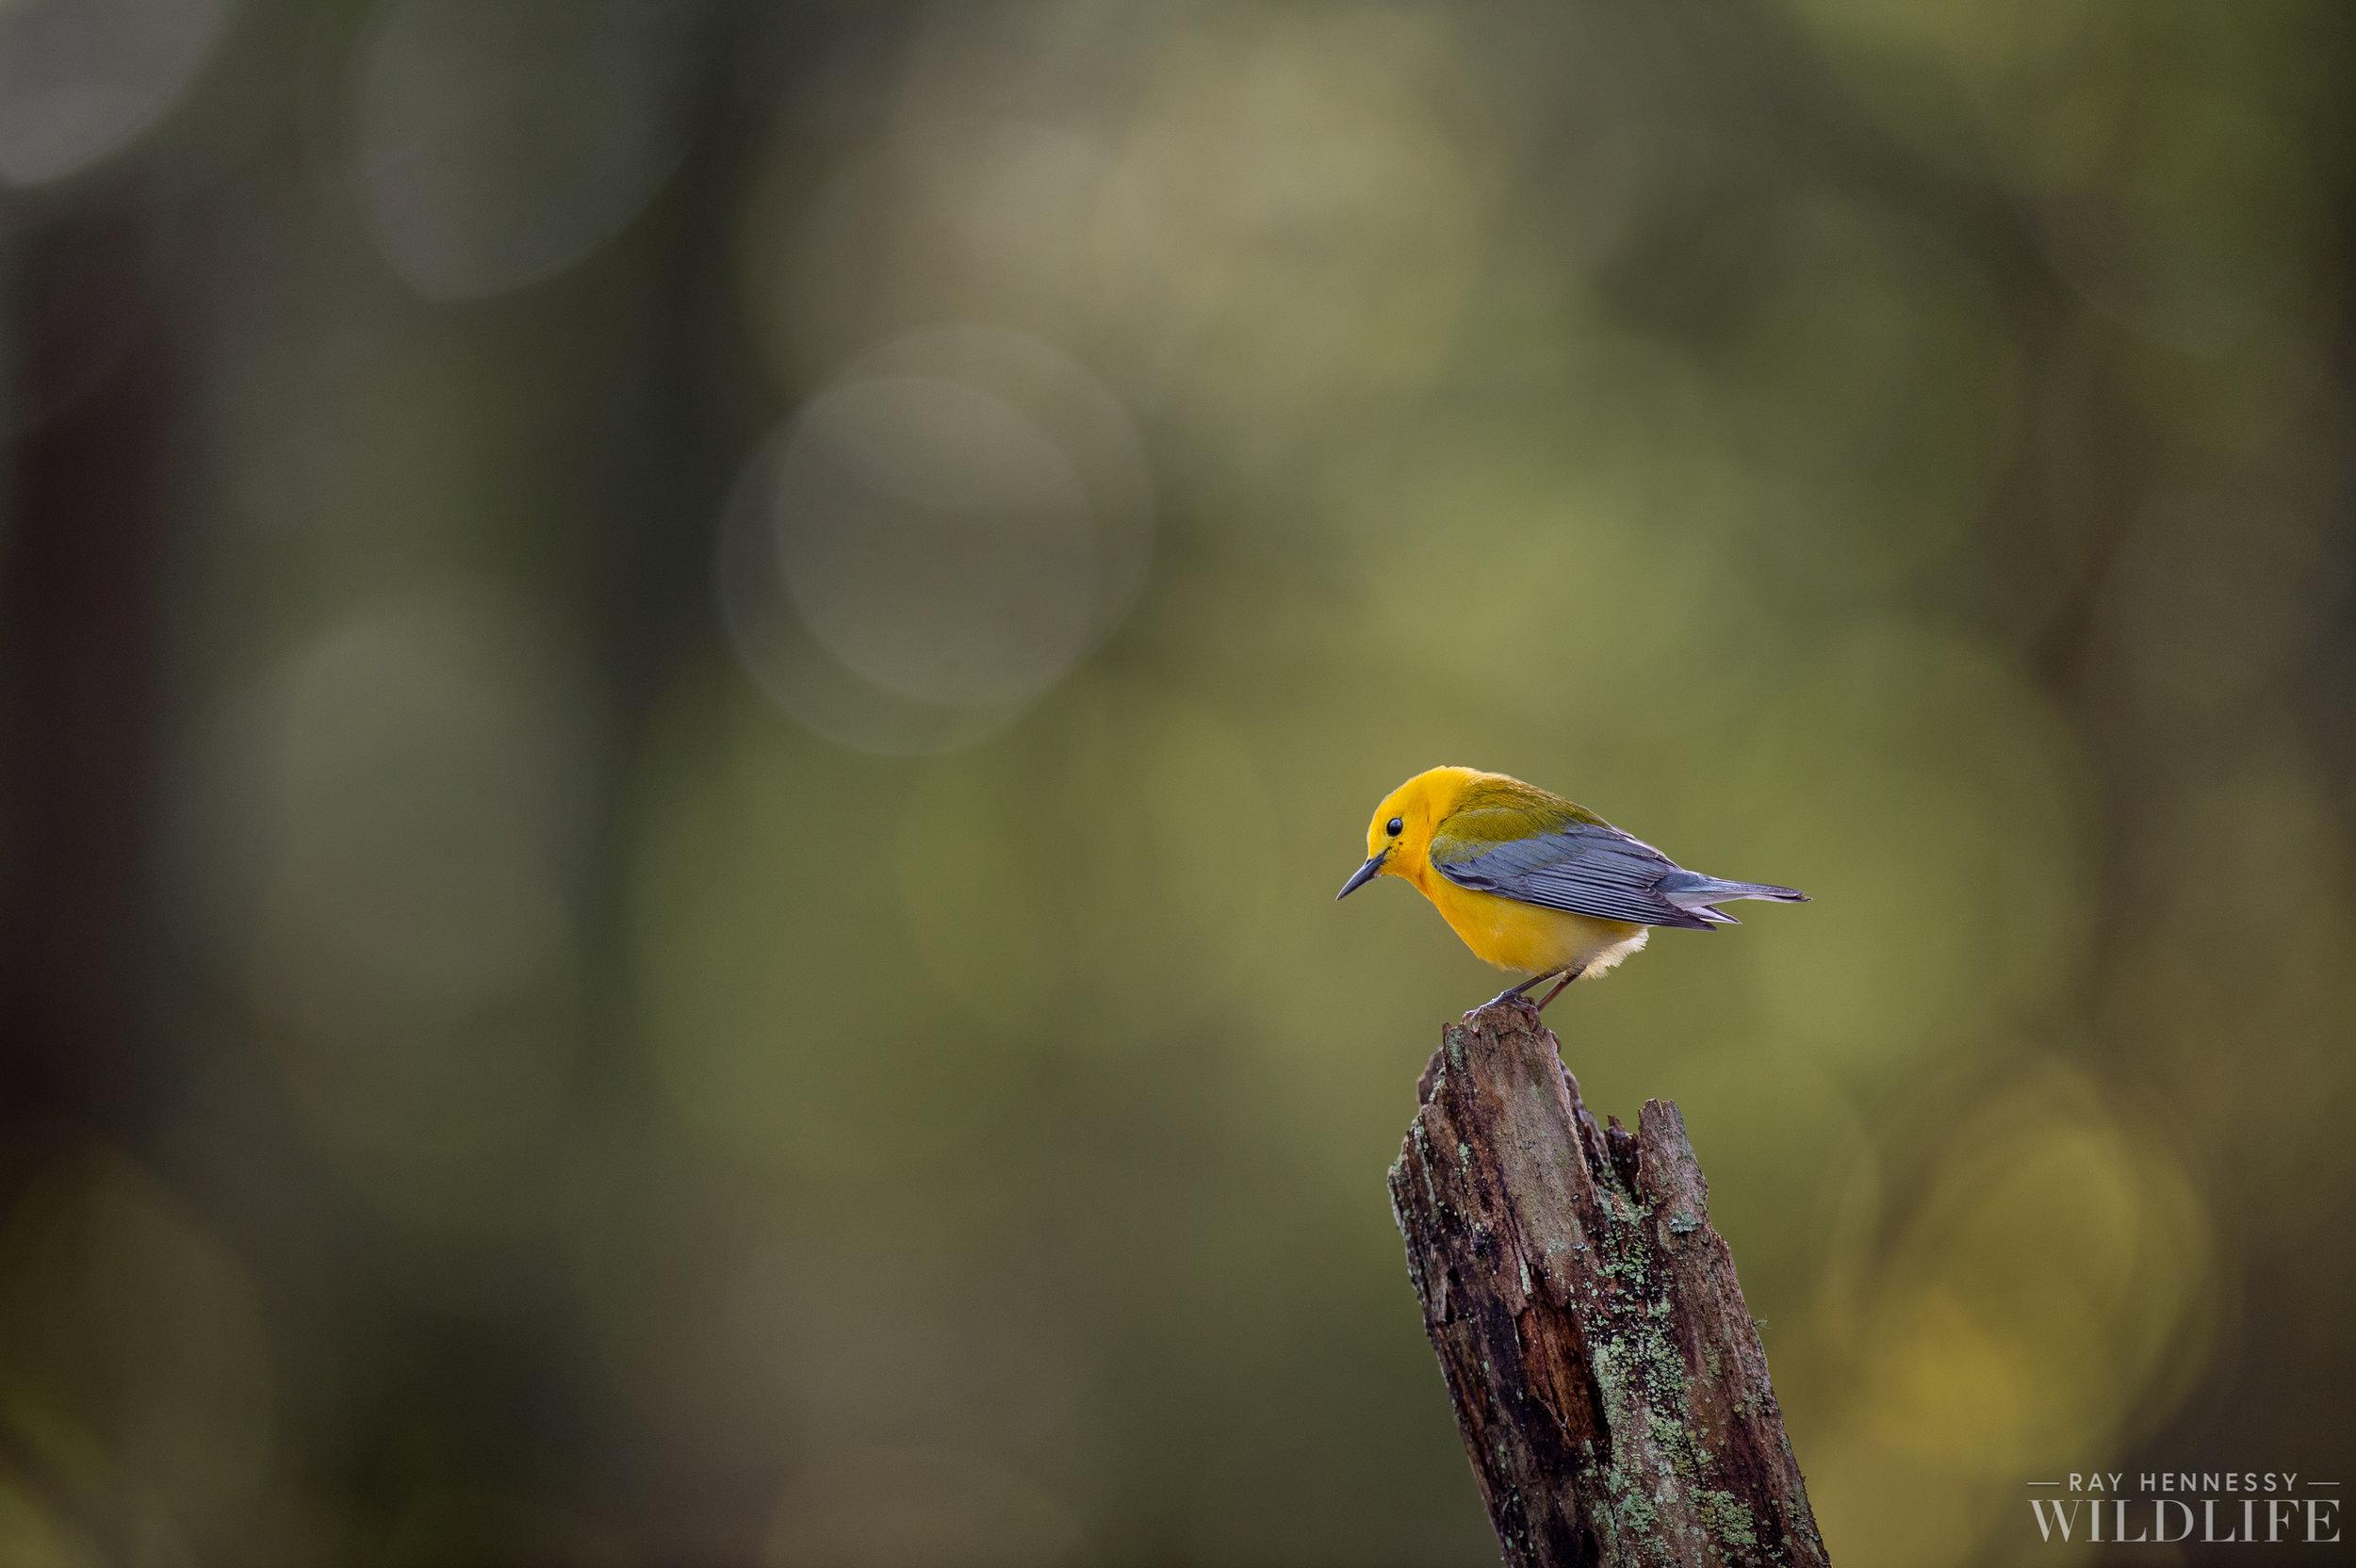 008_Prothonotary Warbler.jpg